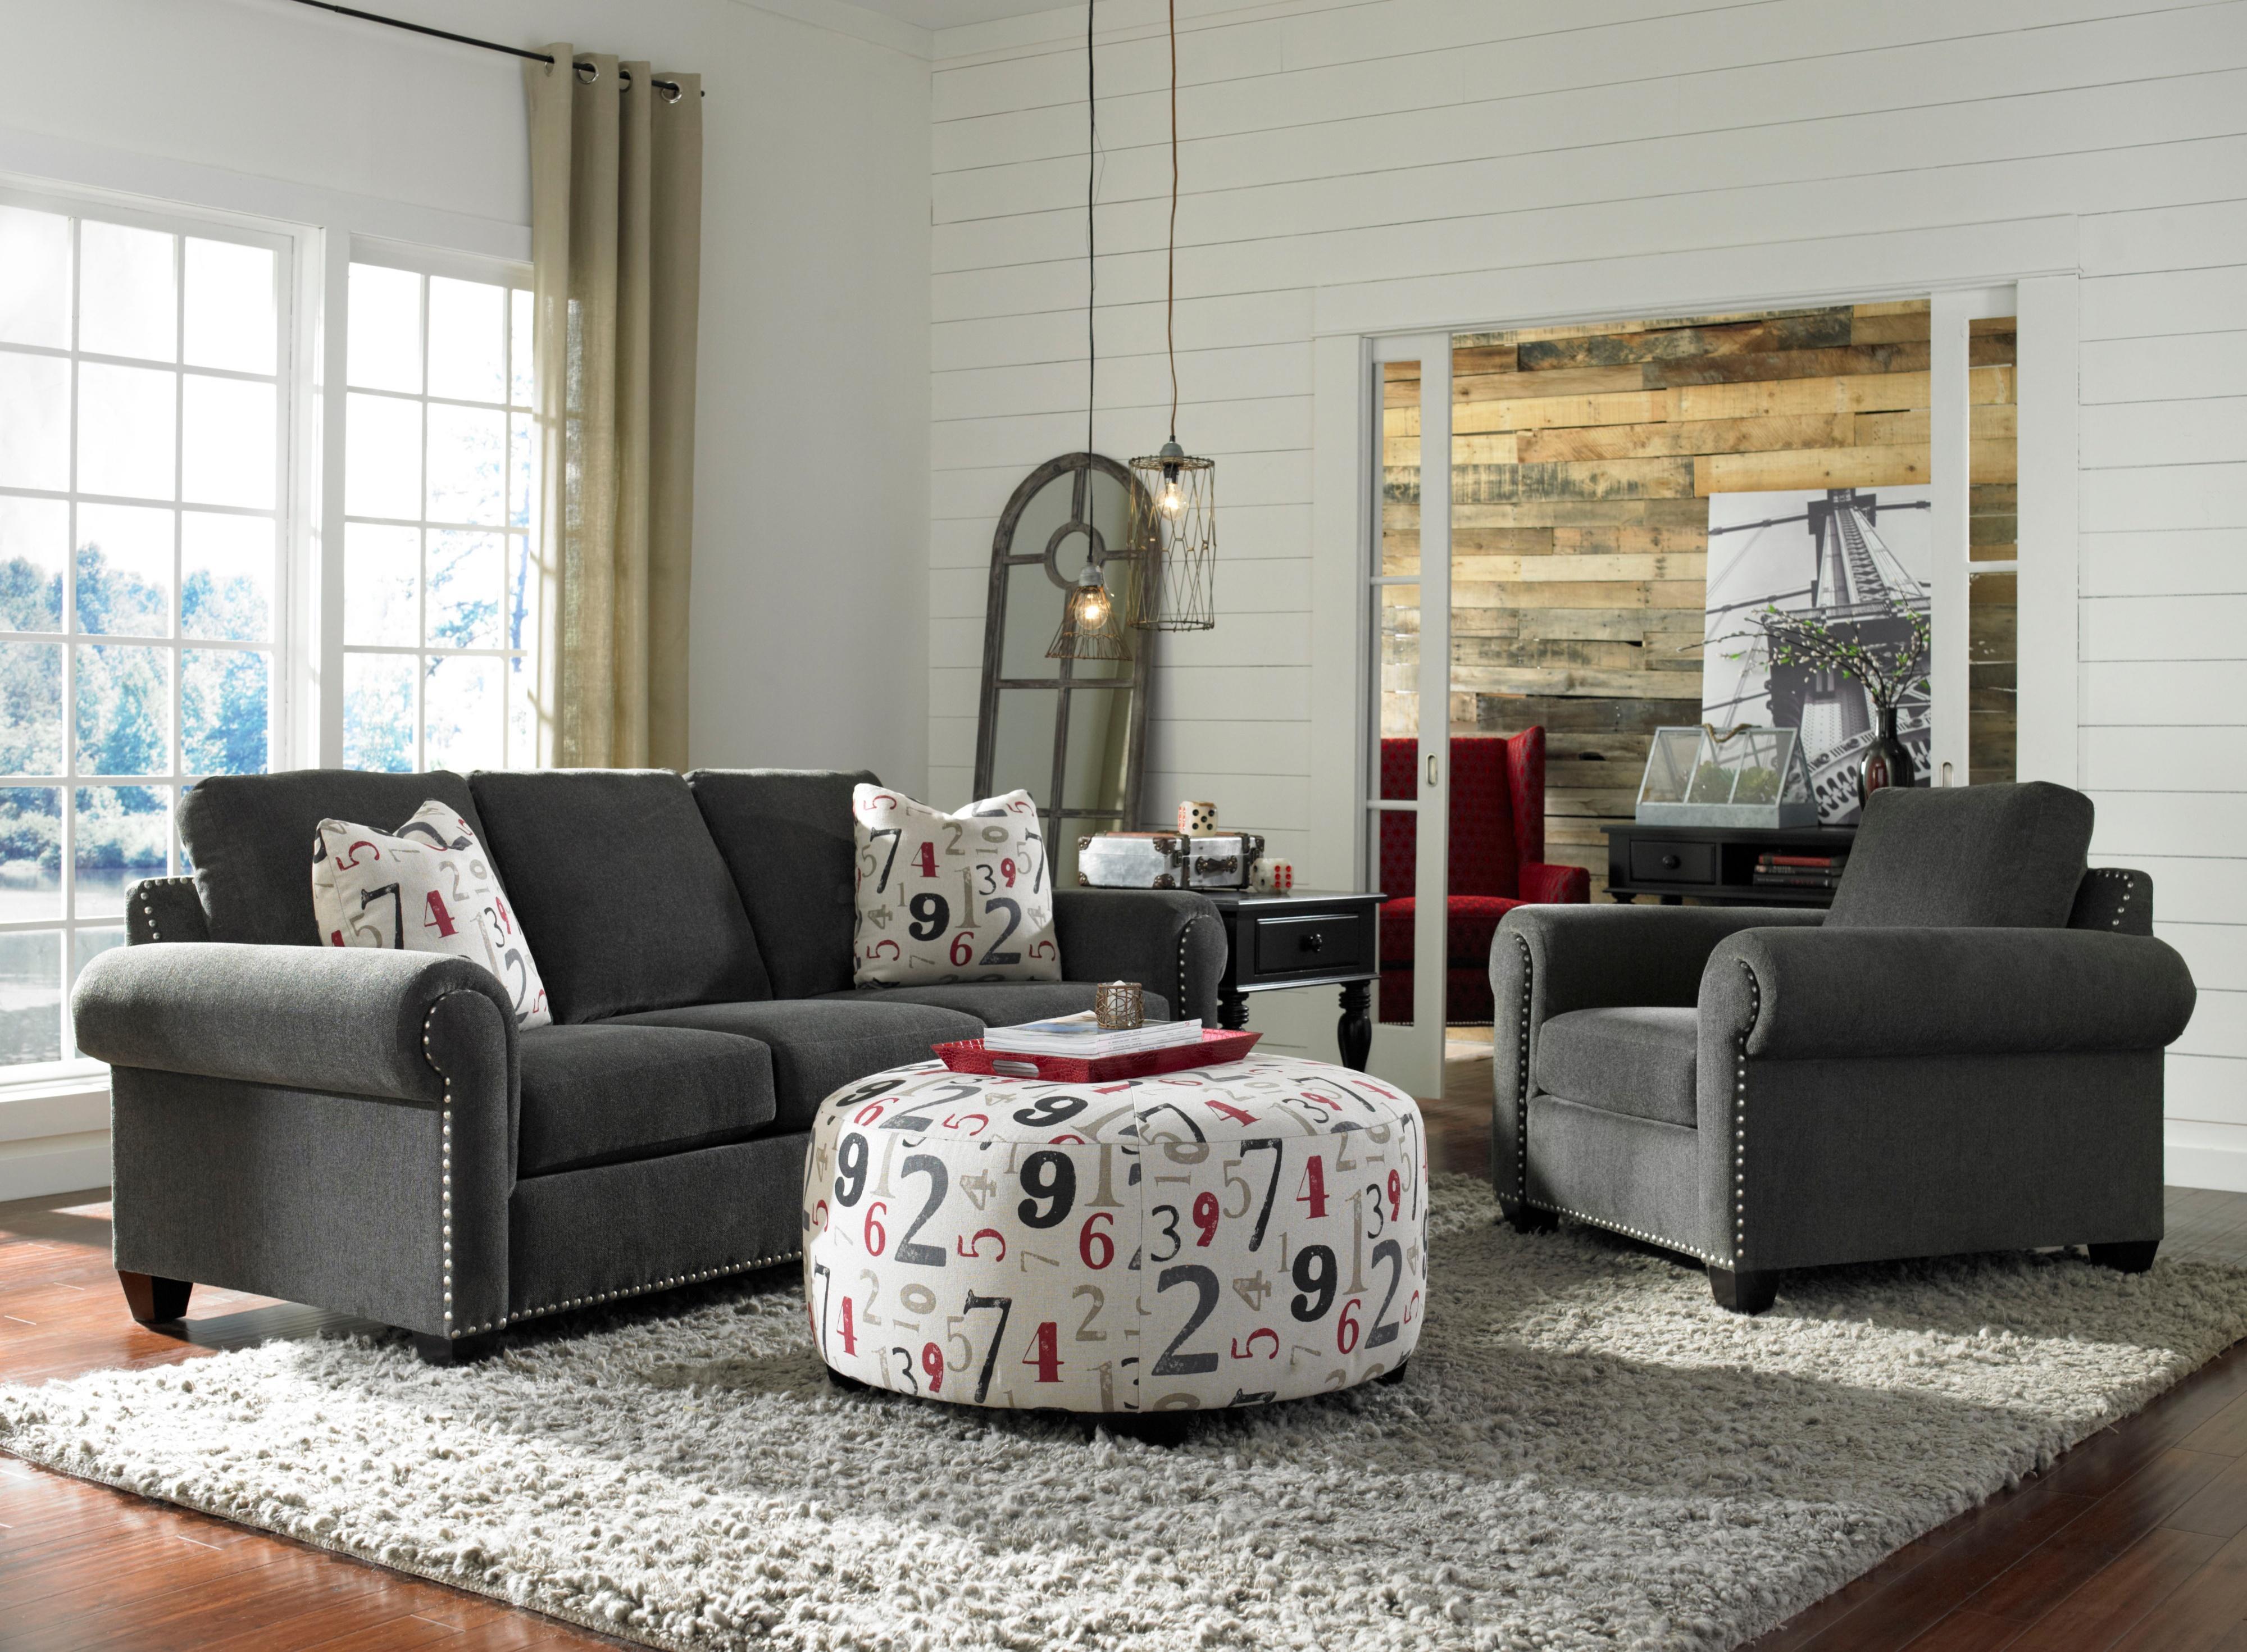 Broyhill Furniture Rowan Stationary Living Room Group - AHFA ...